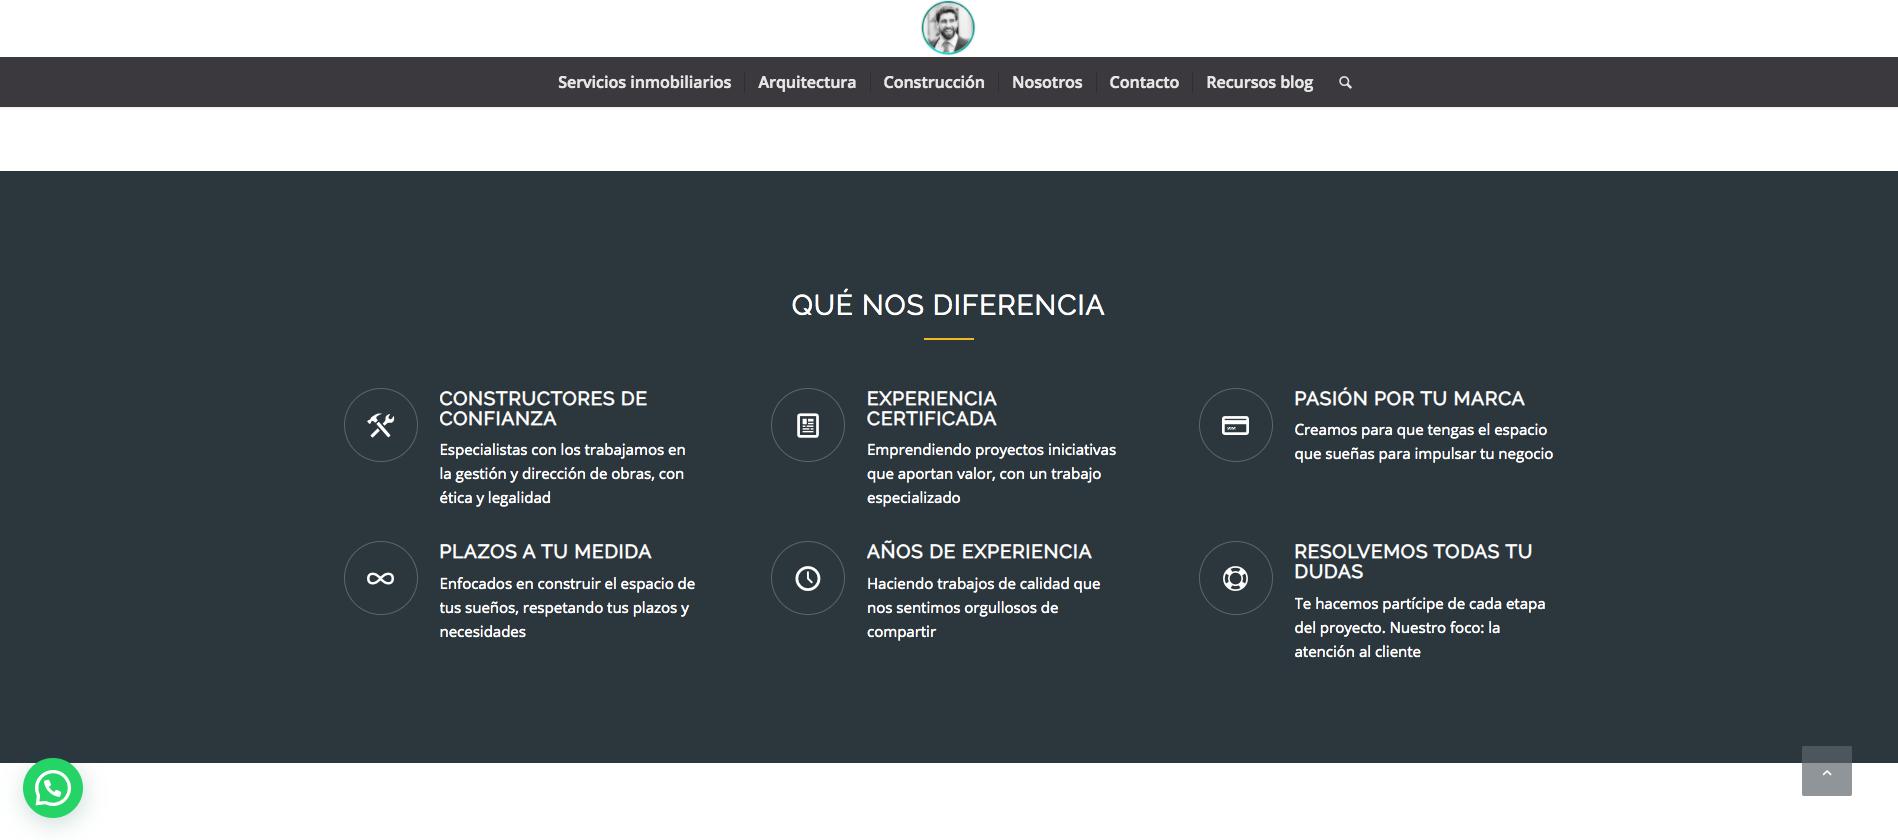 Yacarlí Carreño Santamaría / Proarcom